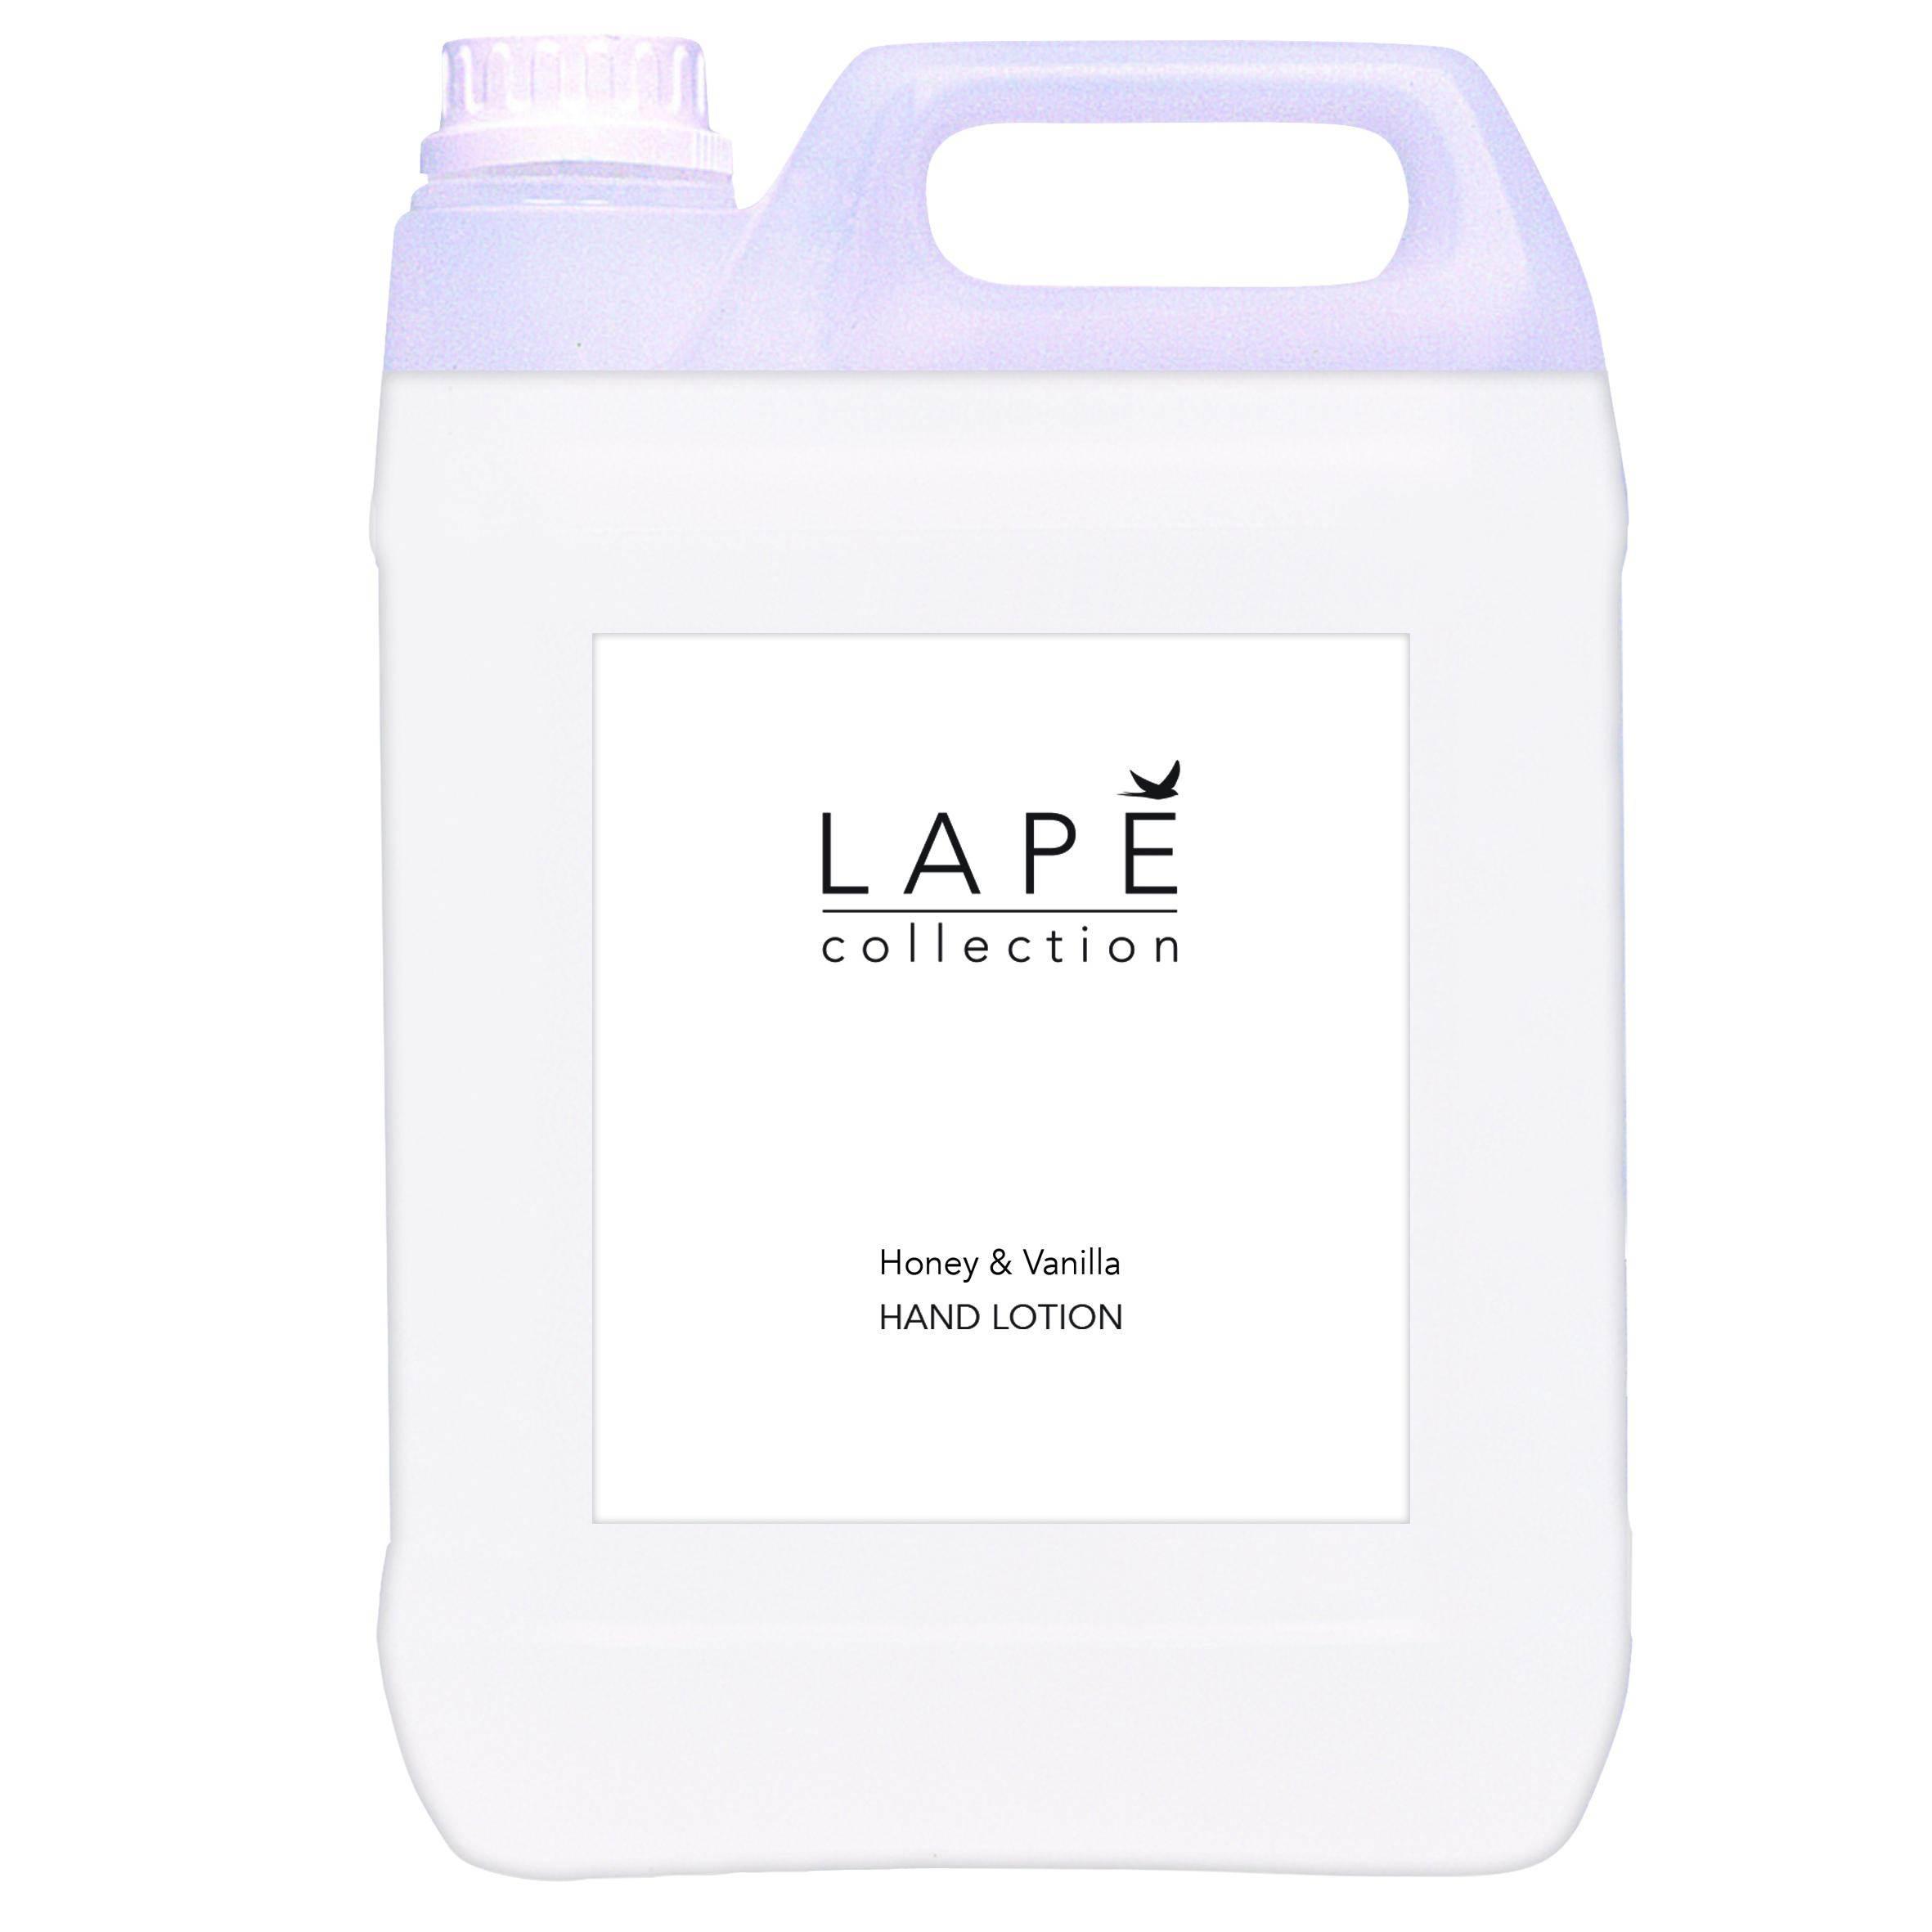 100934578-LAPĒ-Collection-5L-refill-Honey-vanilla-hand-Lotion-pack-shot-CMKY-20x20cm.jpg